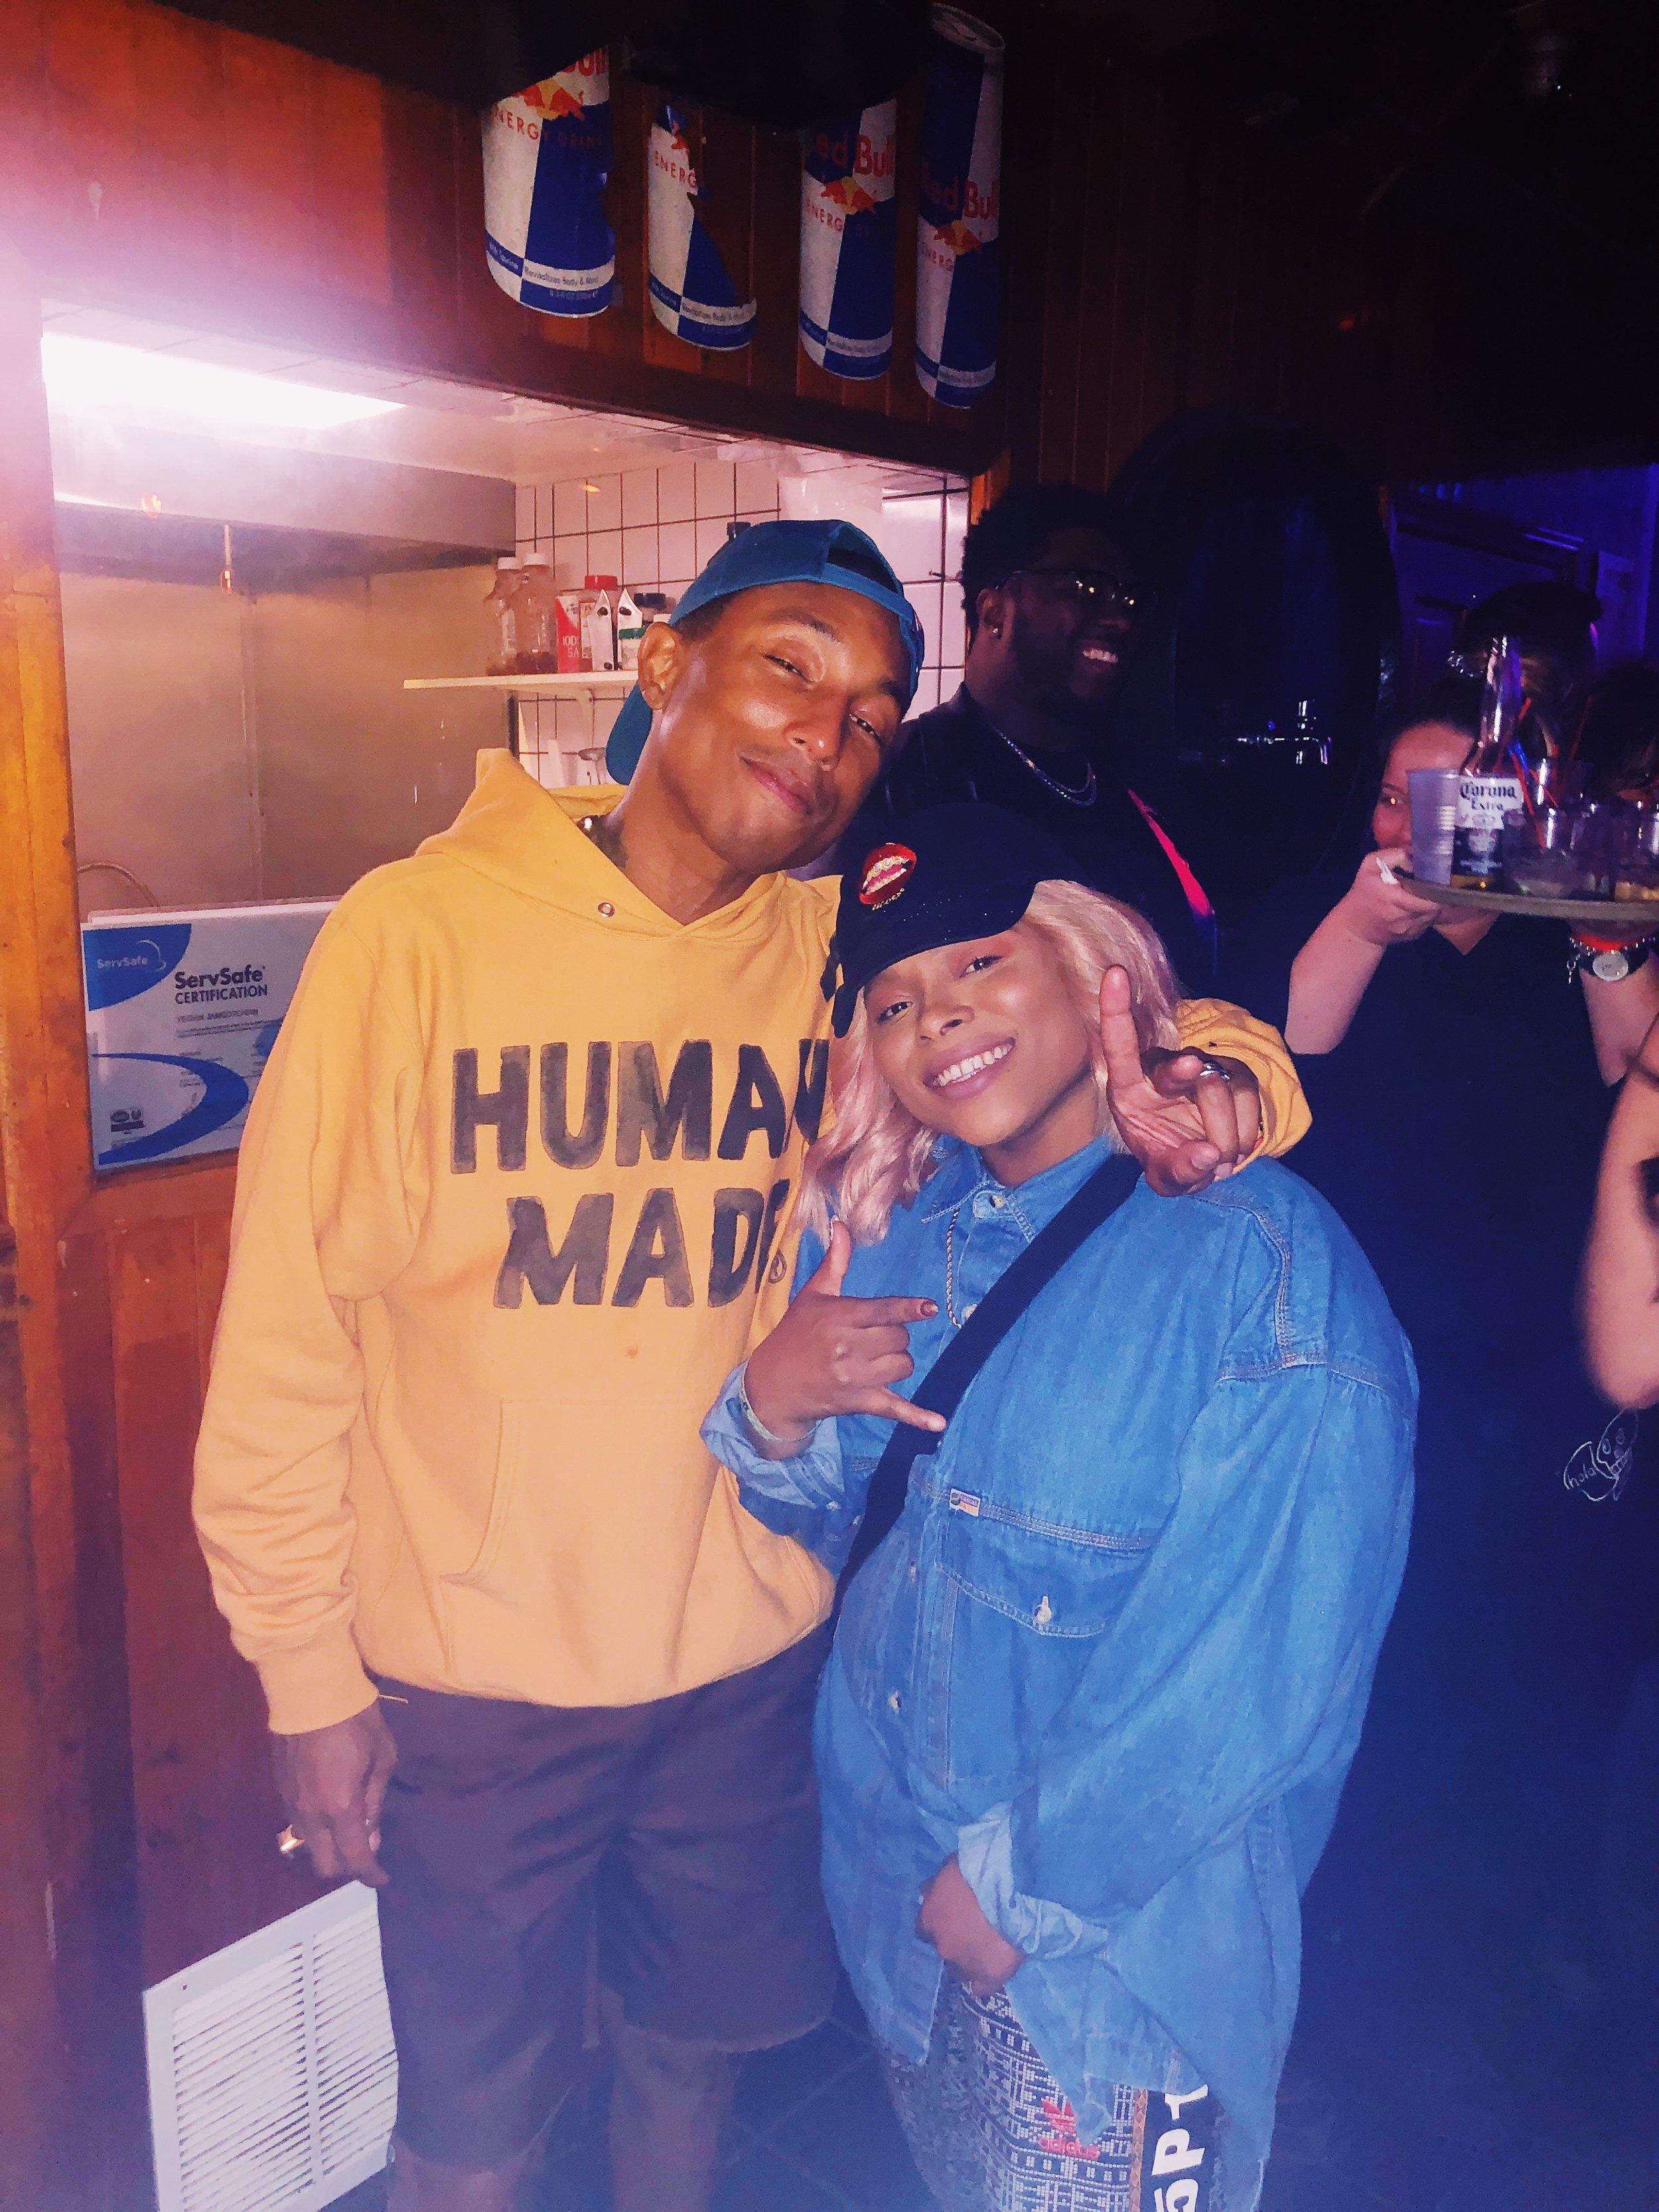 Grammy winning producer Pharrell